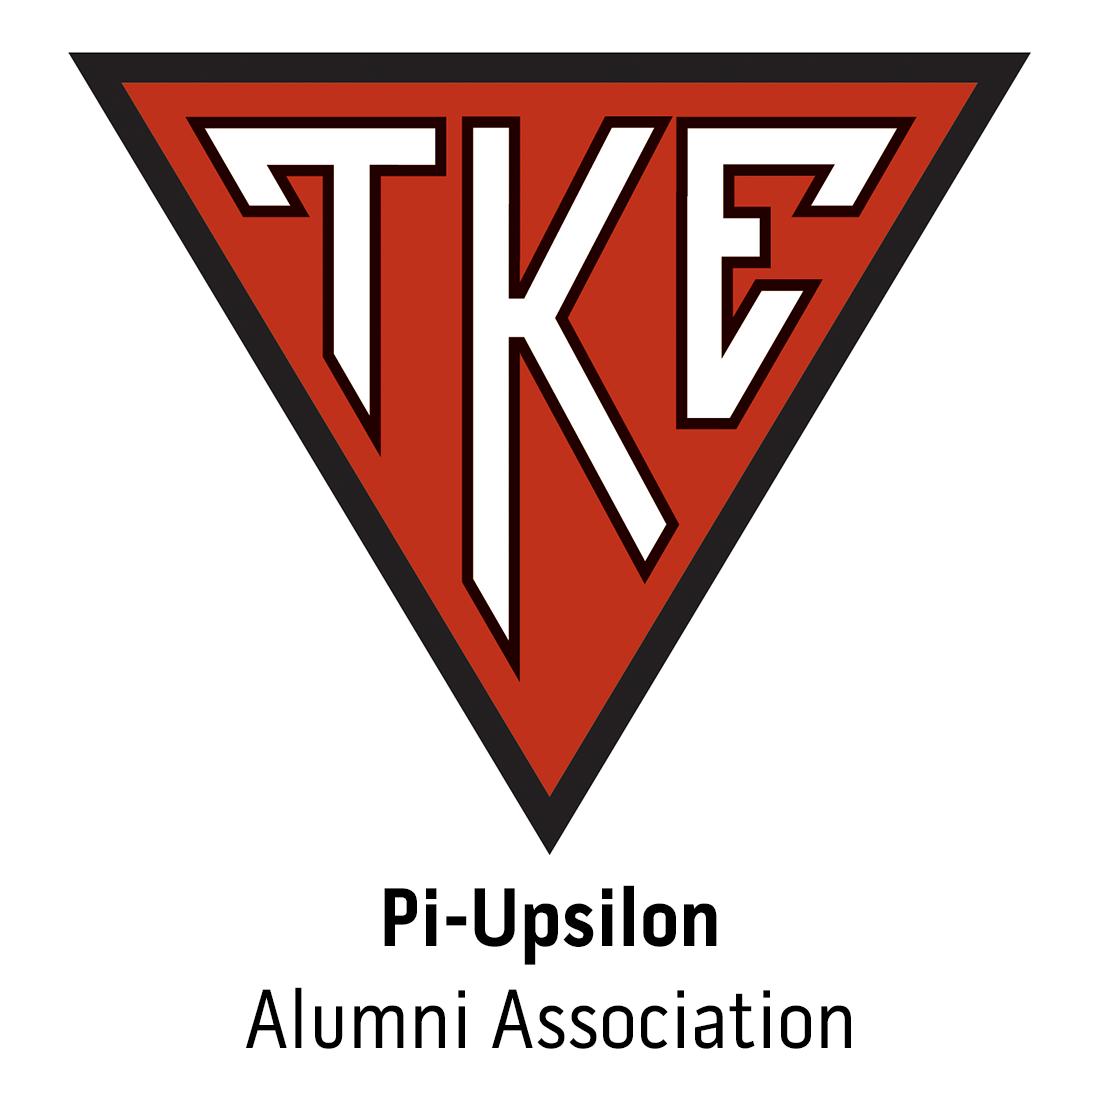 Pi-Upsilon Alumni Association for Towson University